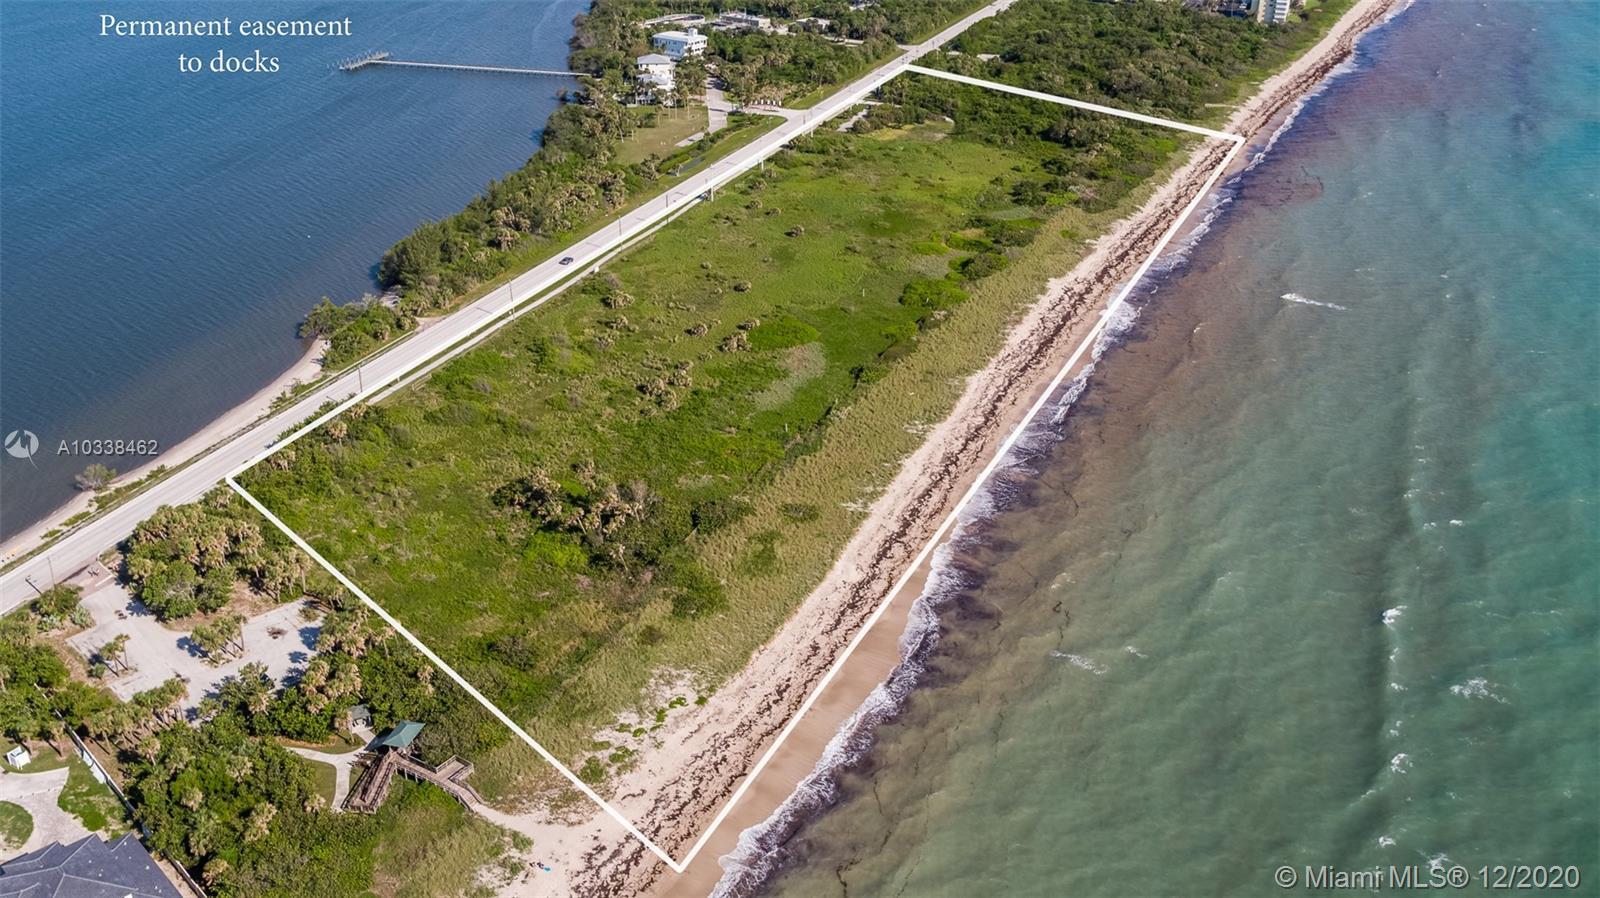 7700 S Ocean Dr, Jensen Beach, Florida 34957, ,Land/boat Docks,For Sale,7700 S Ocean Dr,A10338462